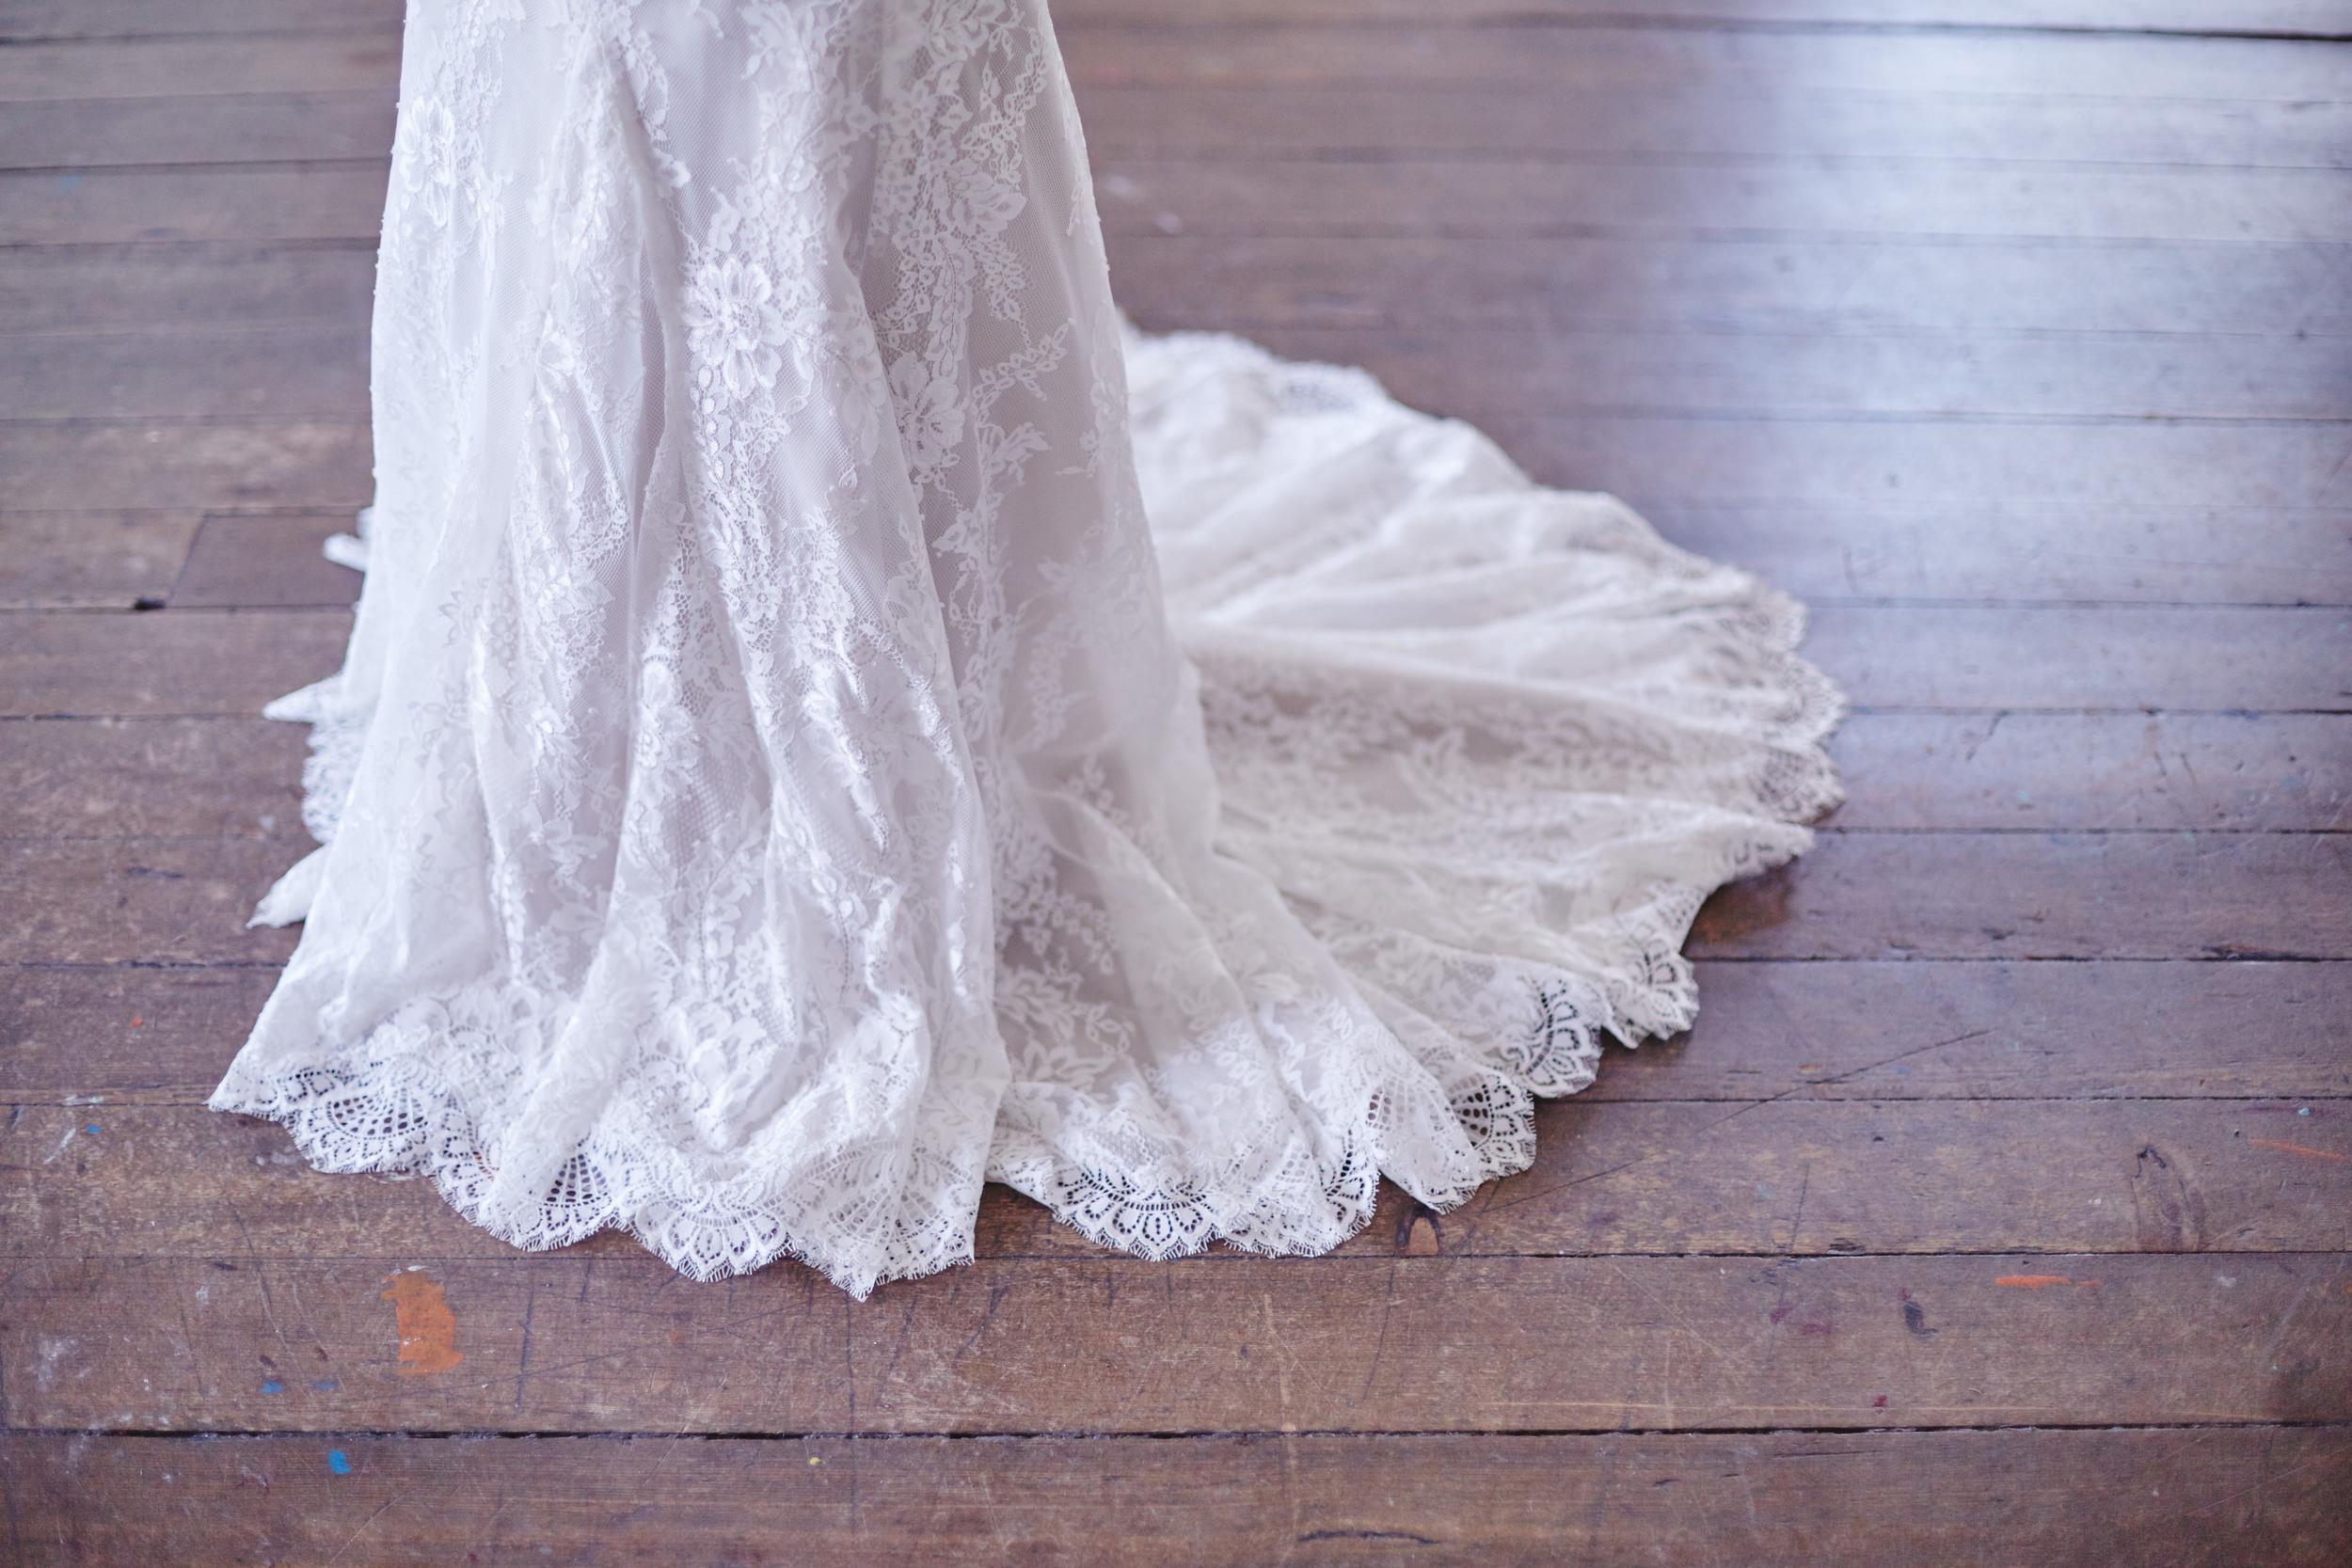 Styled_Session_Becca_Bridal_Portraits_Sarah_Tau_Photography_HOB_Studio_285 49.jpg